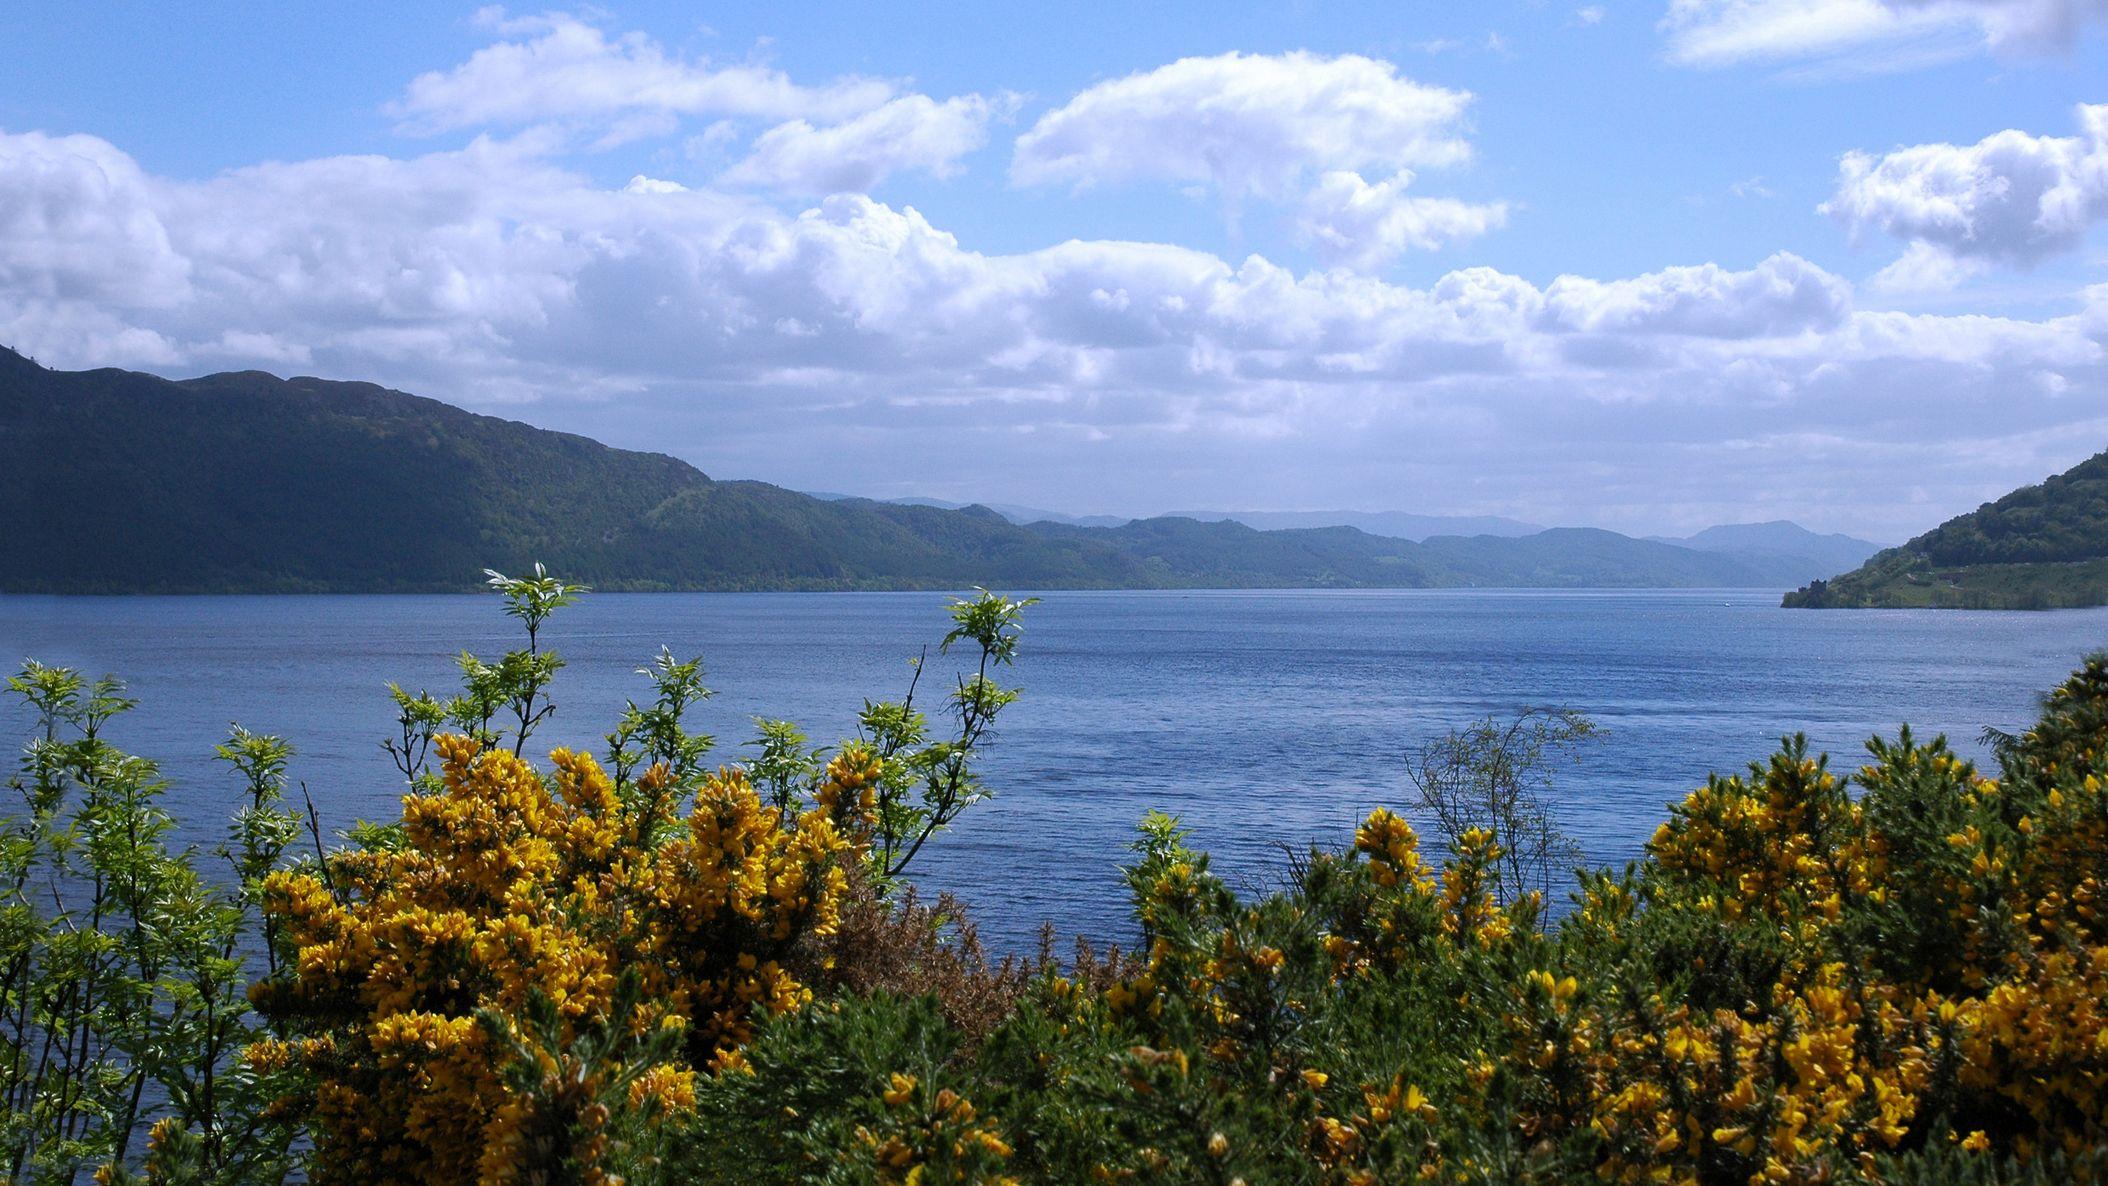 3-Day Tour to Edinburgh, Loch Ness & the Highlands